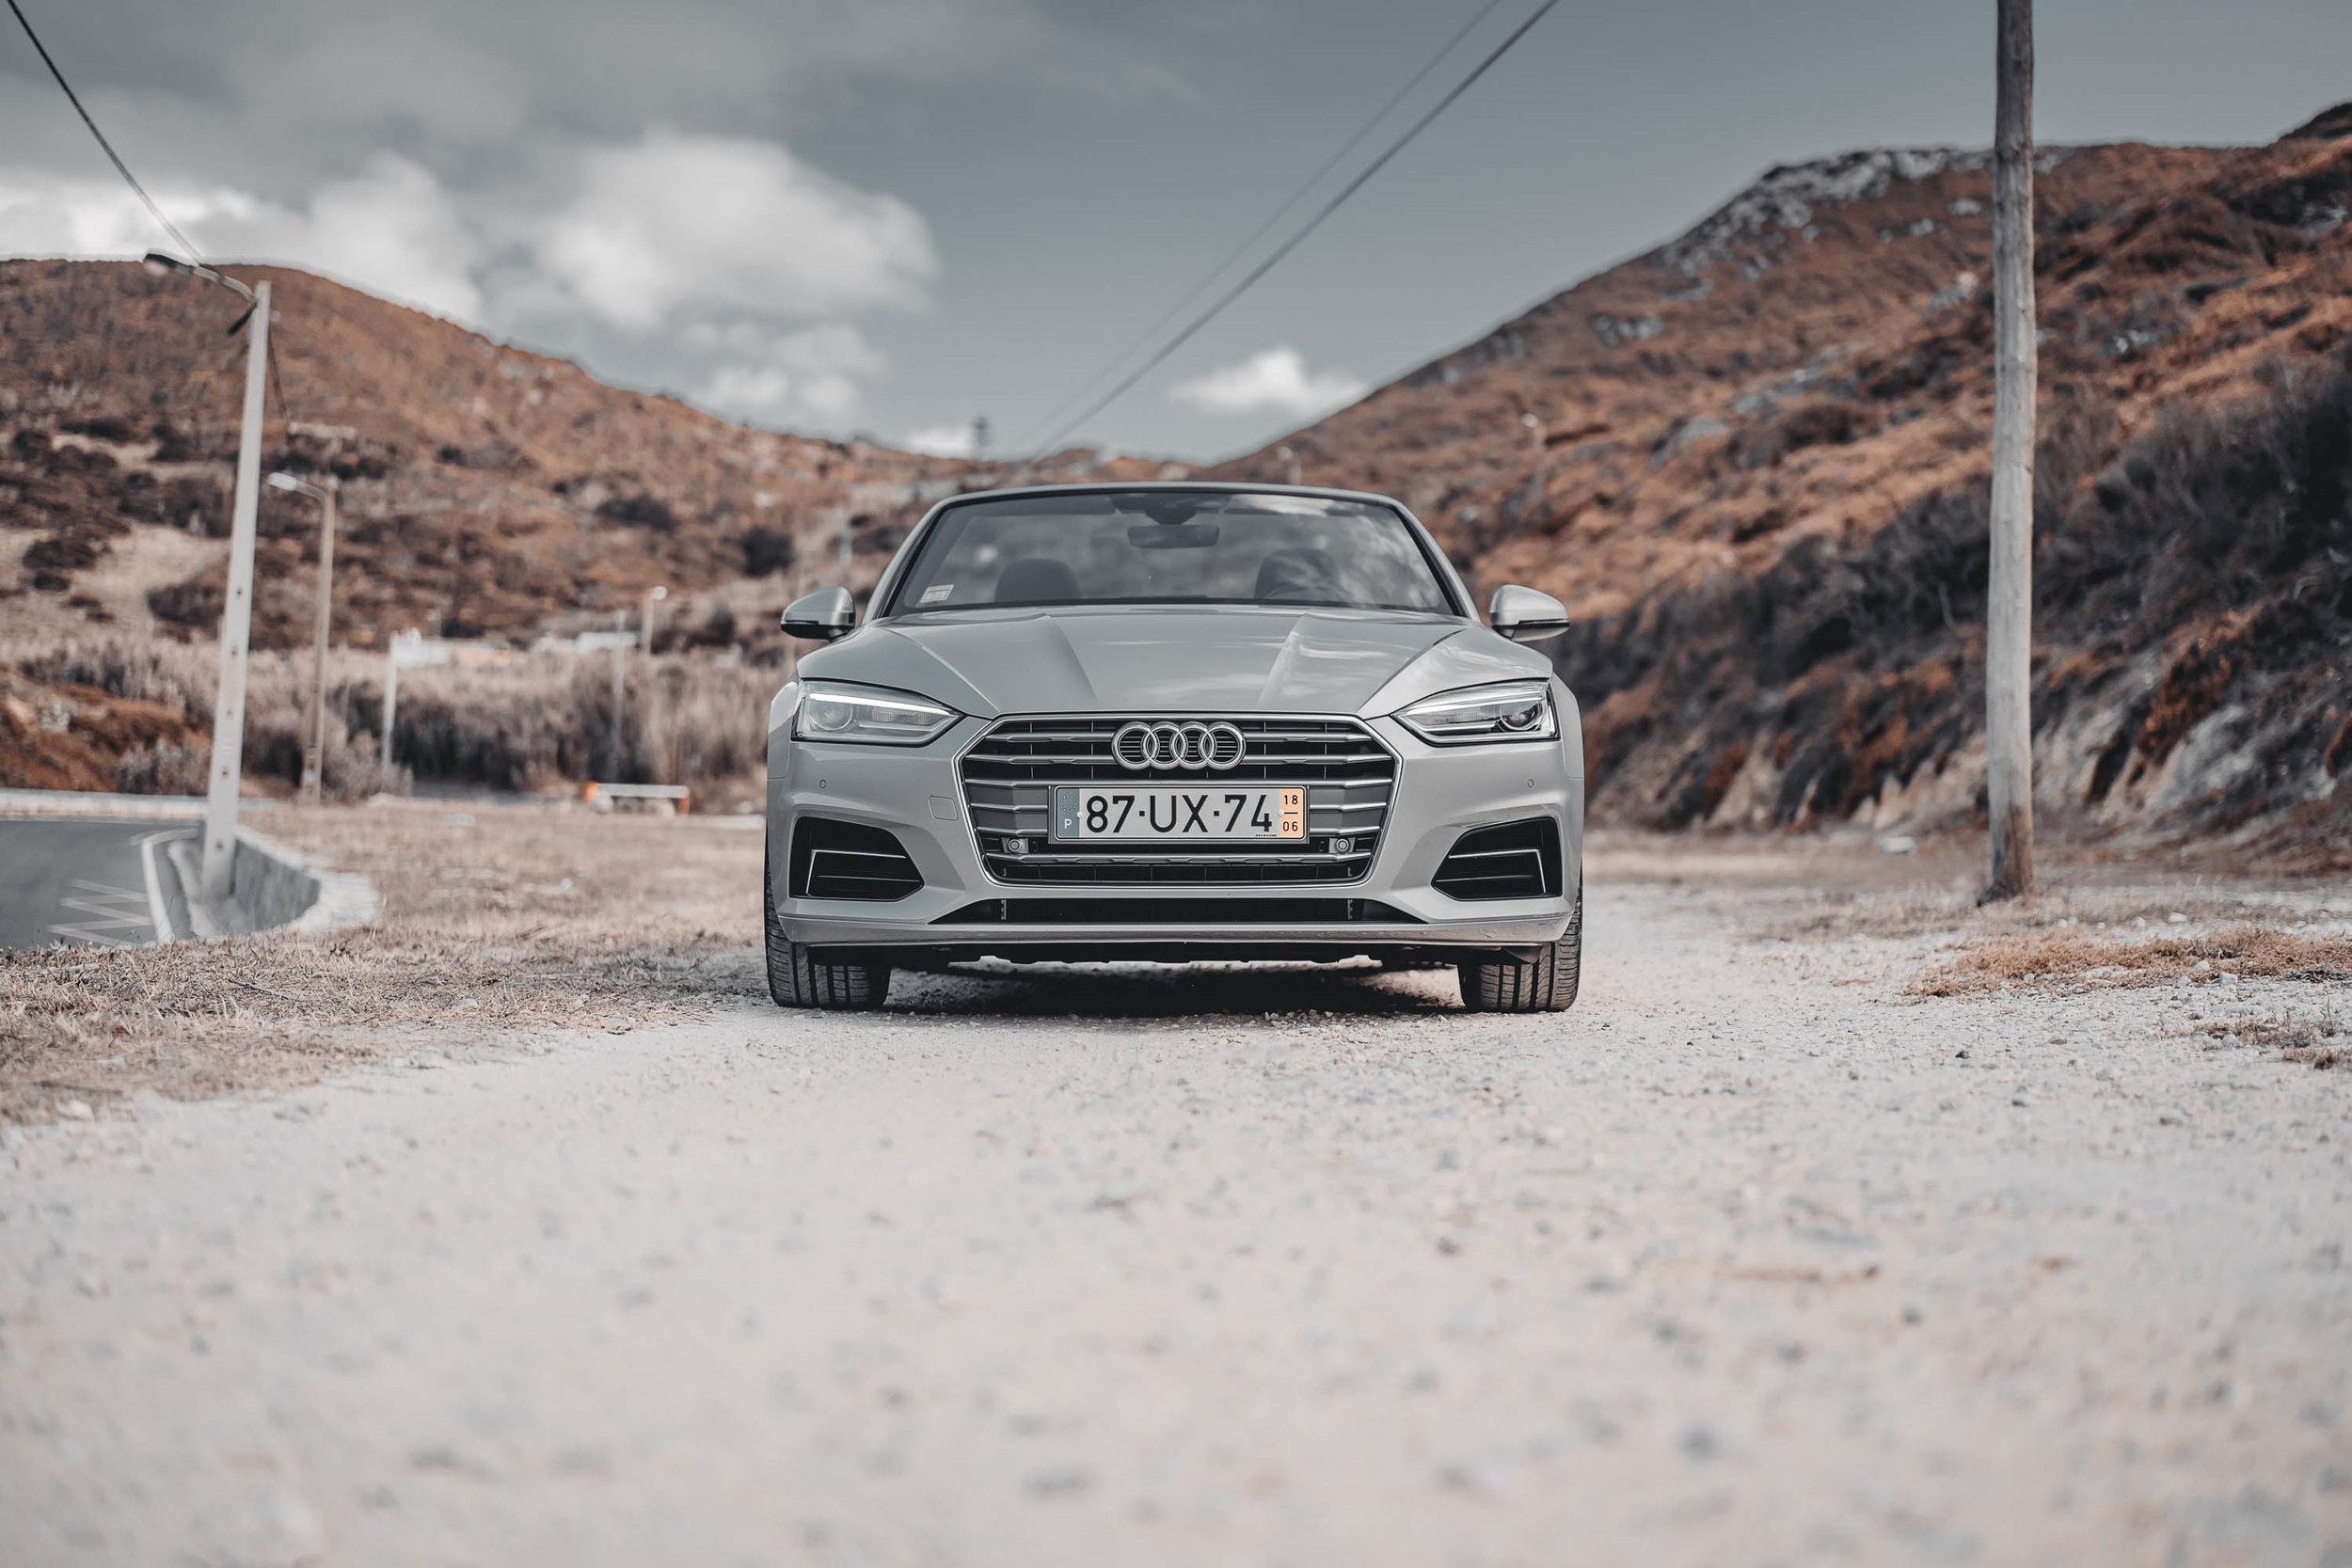 Maximilian_Otto_Audi_A5_Cabriolet_Portugal_09_WEB.jpg